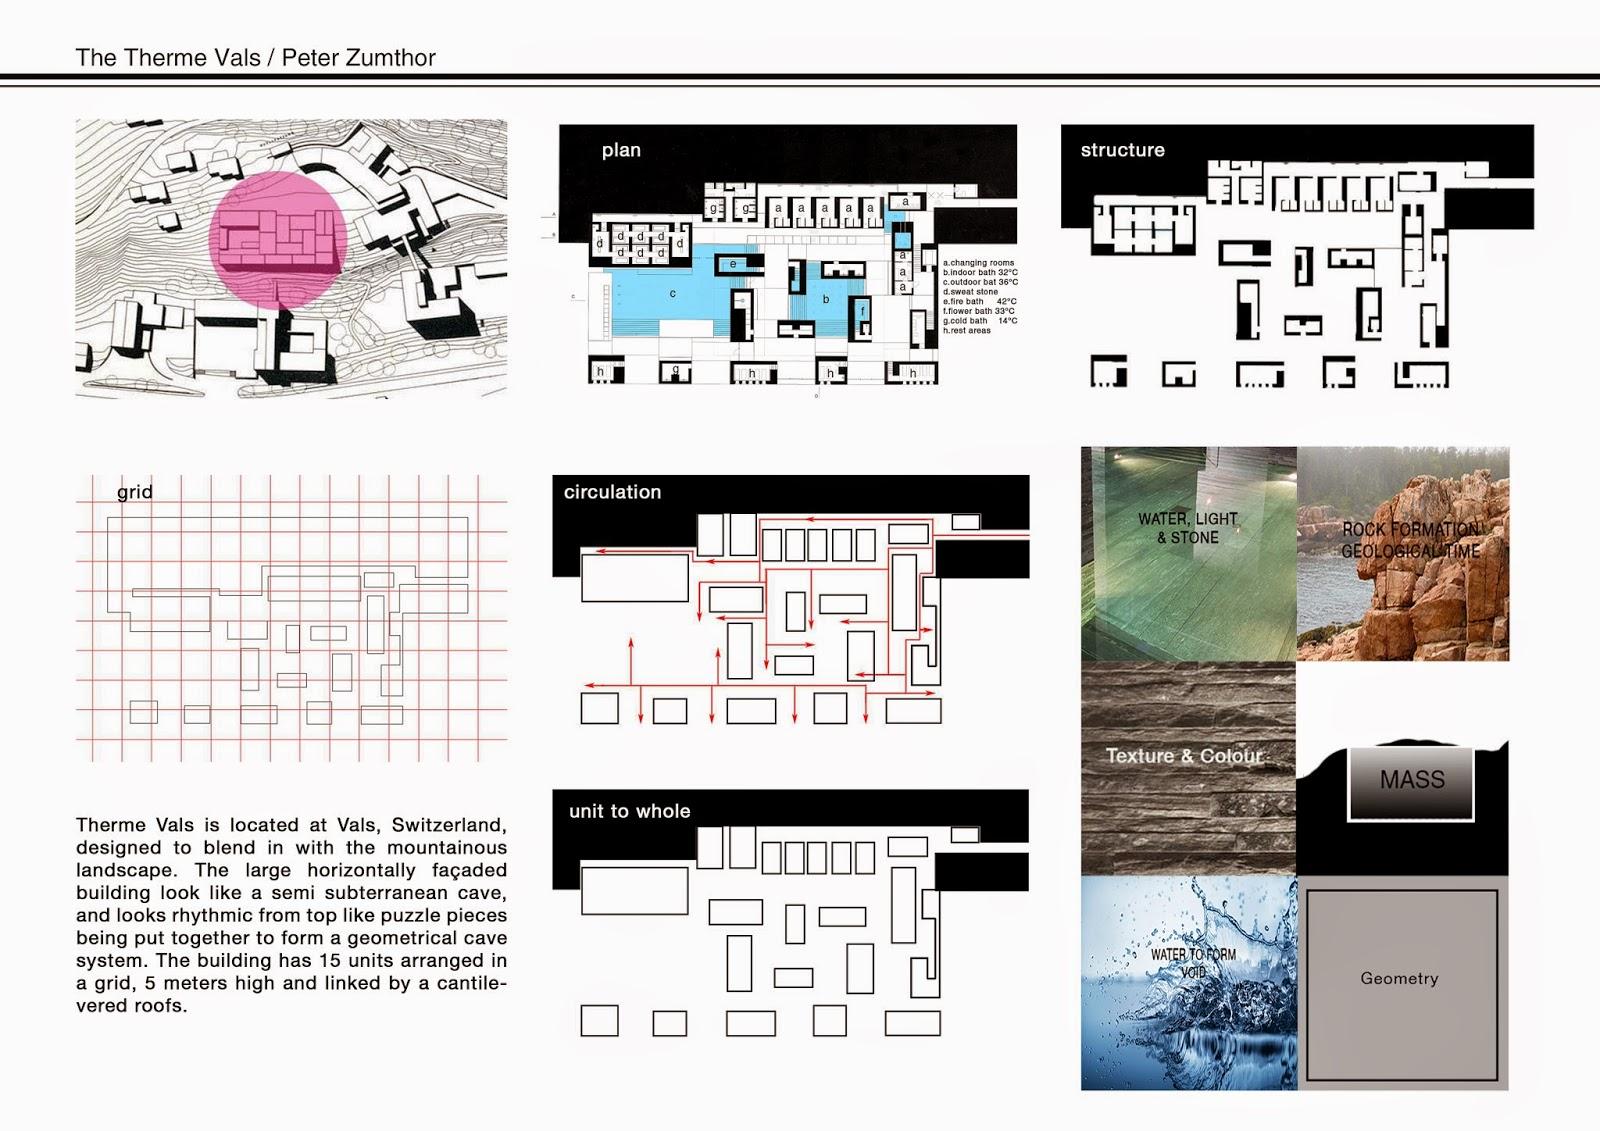 wong zi xiu degree e portfolio design studio 3 therme vals spatial typology board